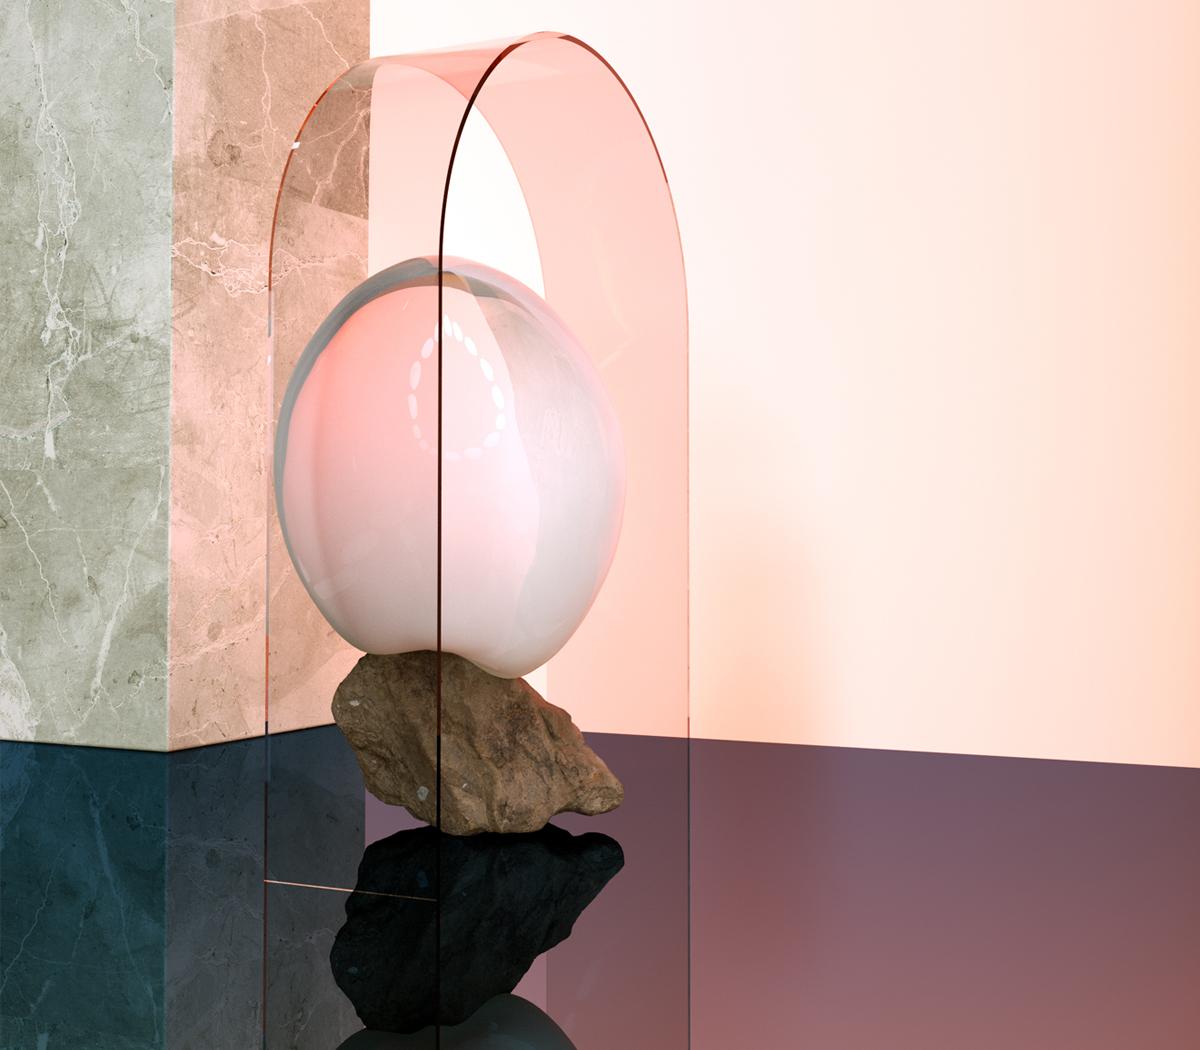 Abstract Slick 3D Sculptures